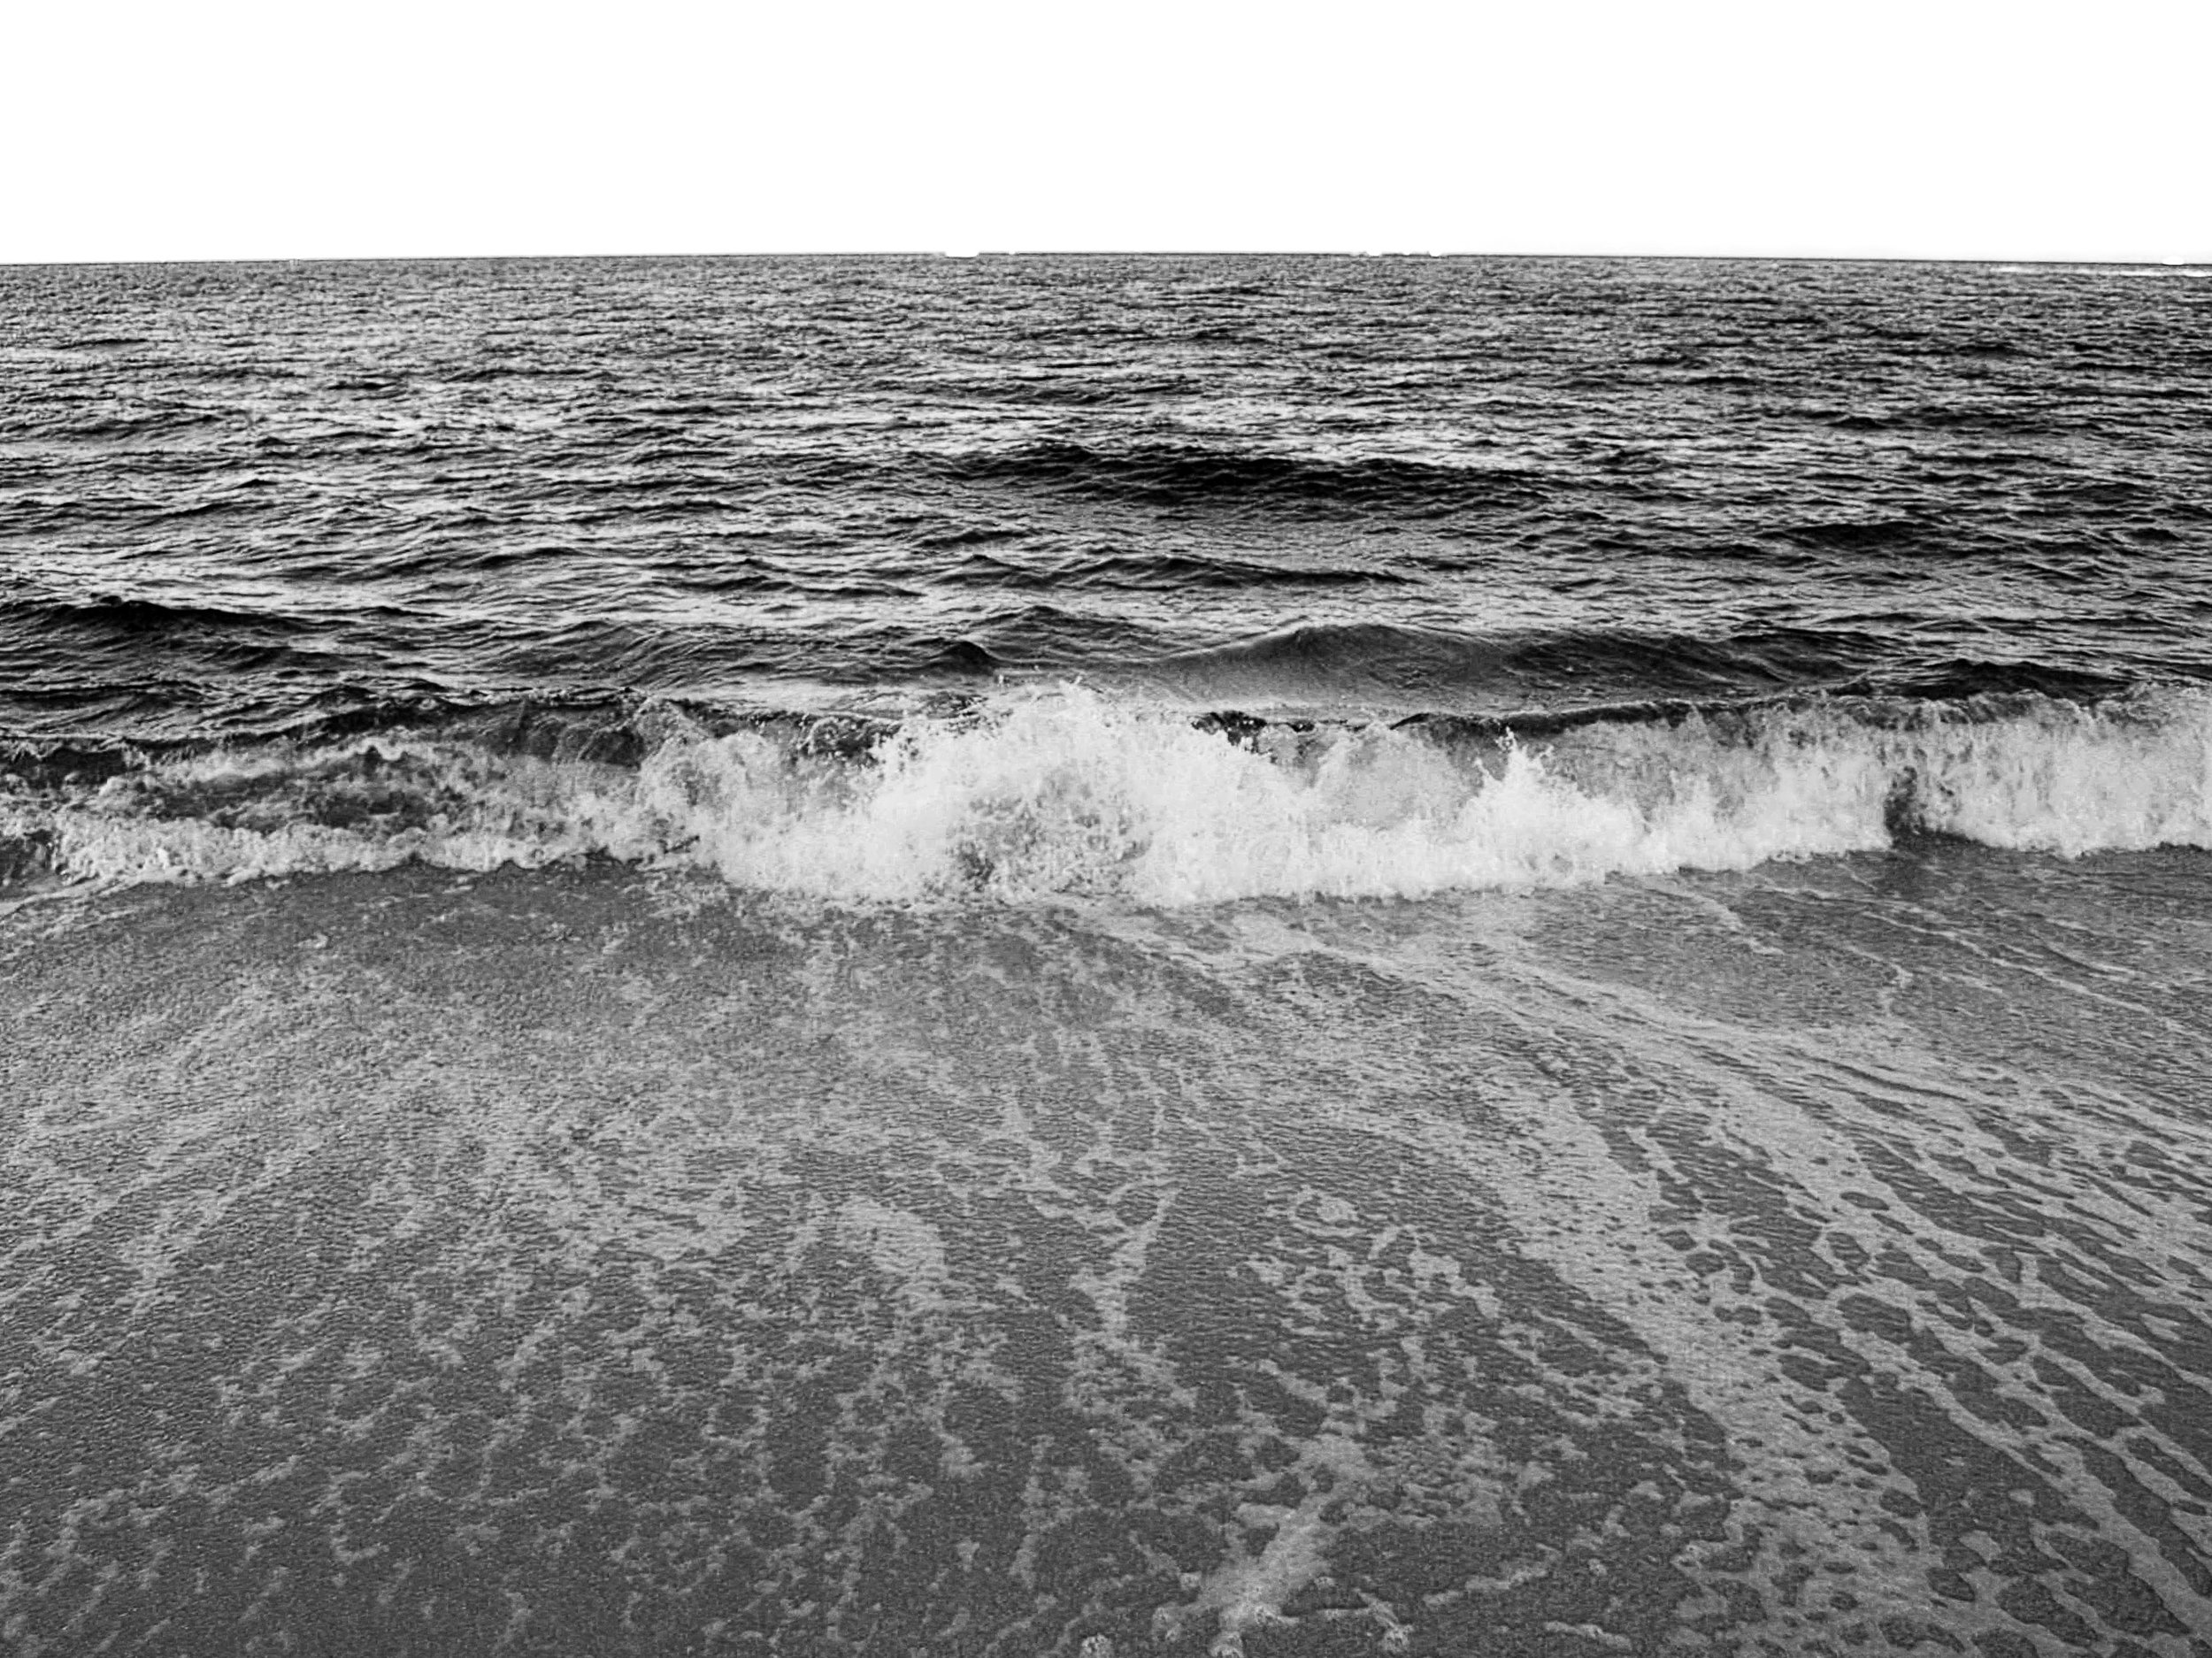 black_and_white_ocean_photography.JPG